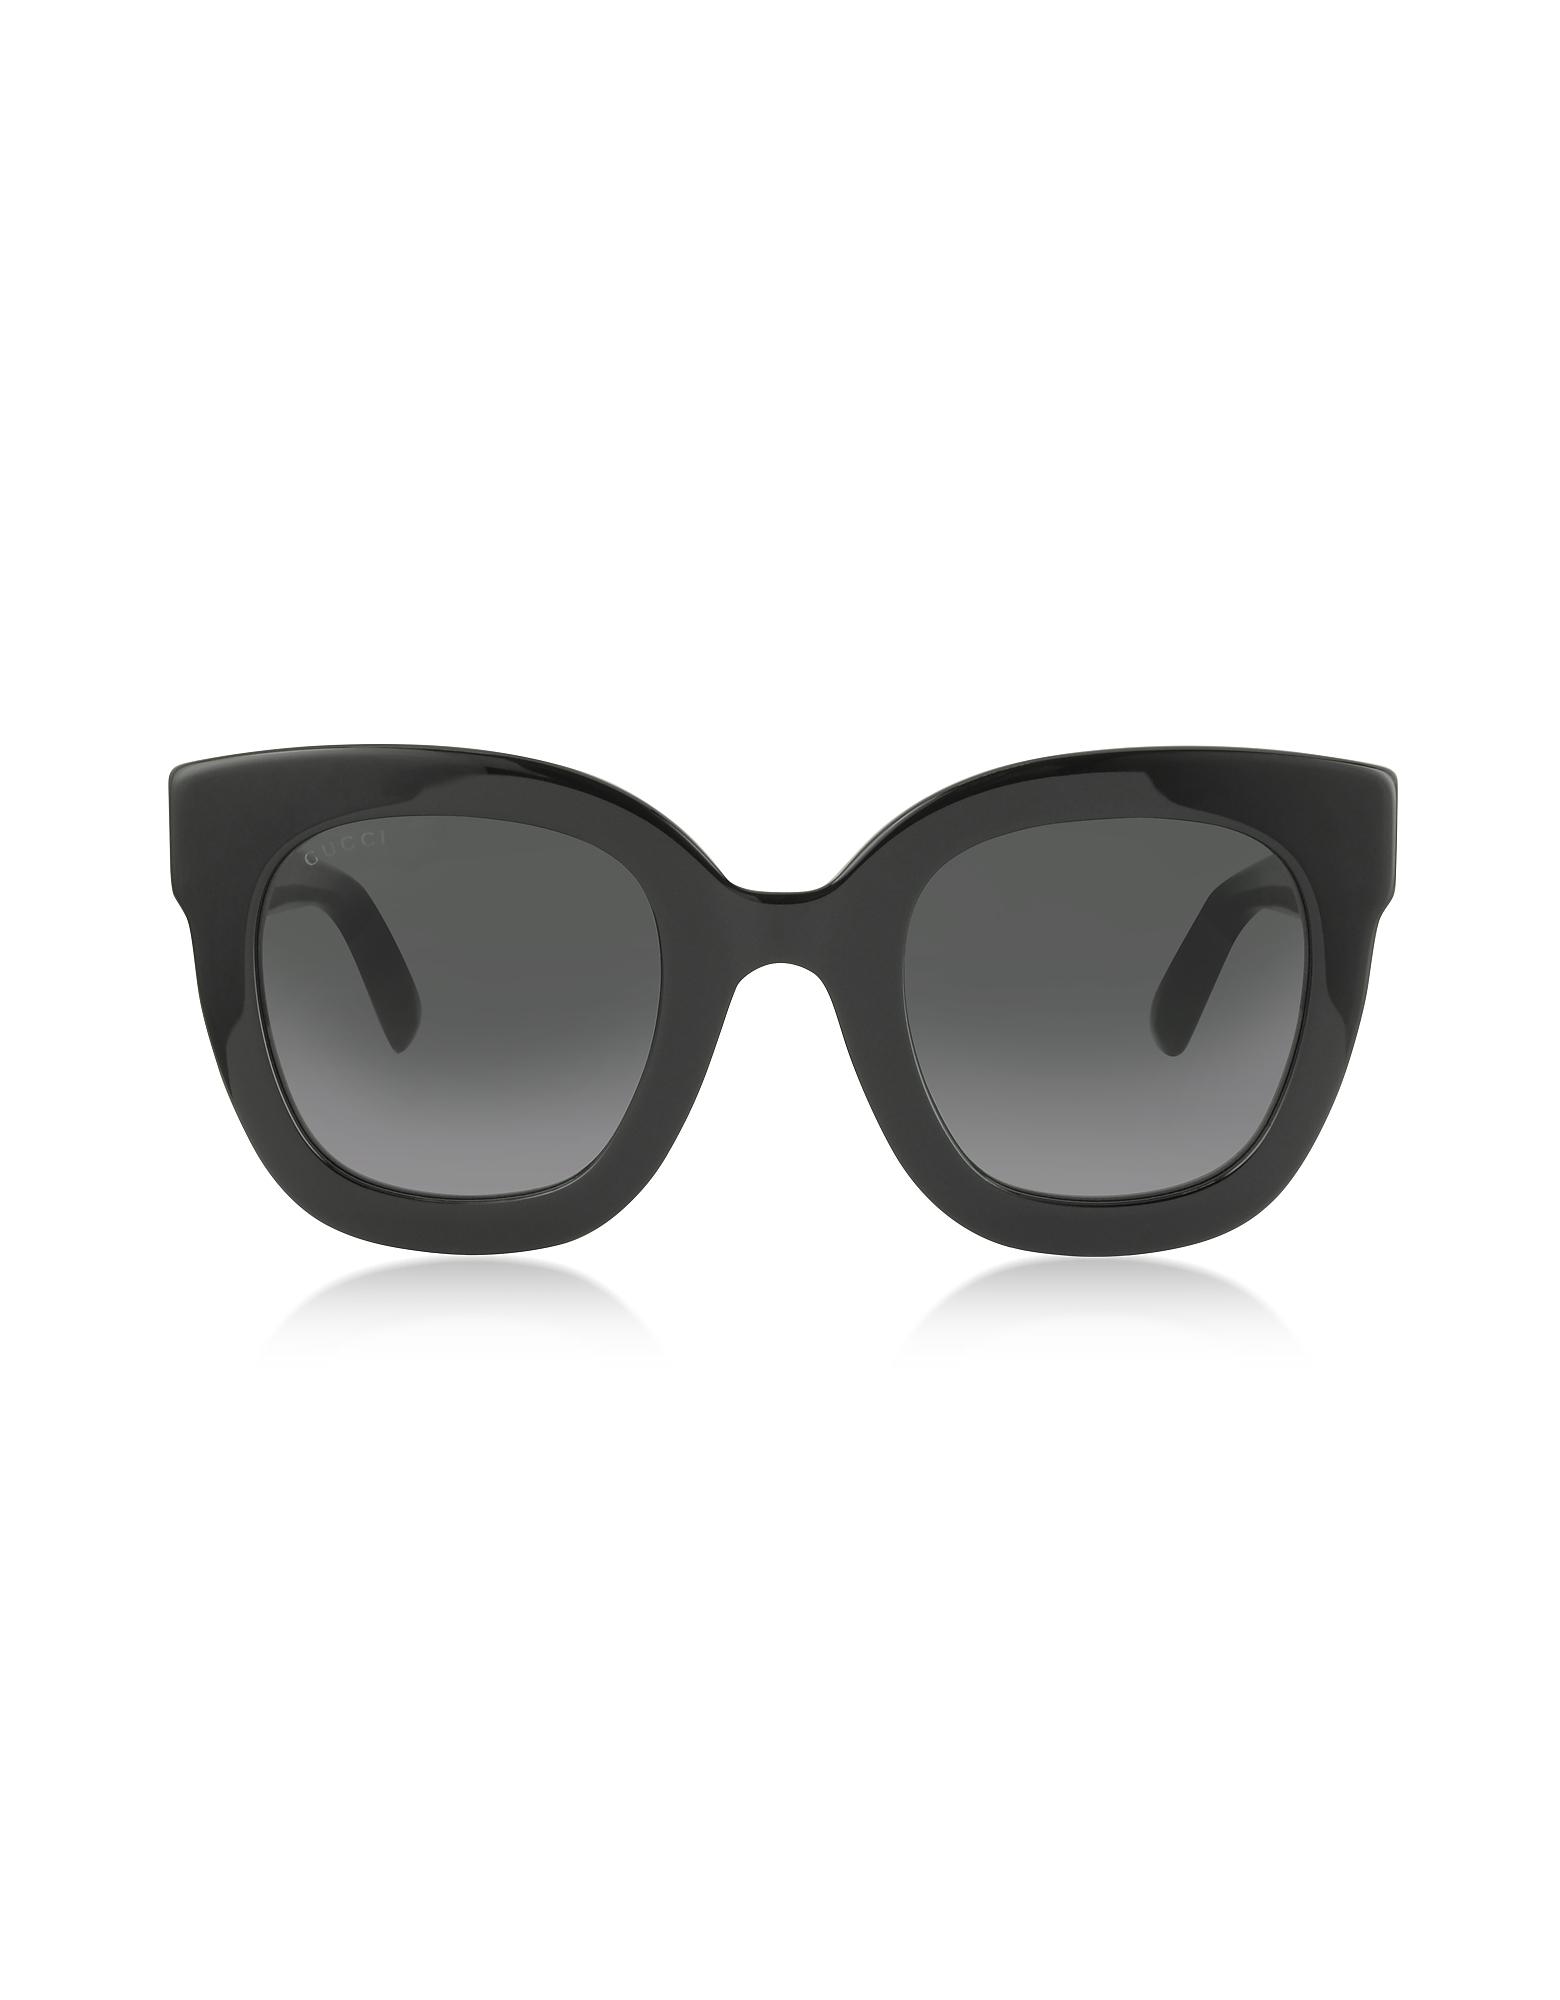 dc2eea48509 Gucci oversized rectangle sunglasses in acetate. Lens bridge temple (in  mm)  49-28-140. Gradient lenses  logo script at right. Interlocking GG logo  and ...